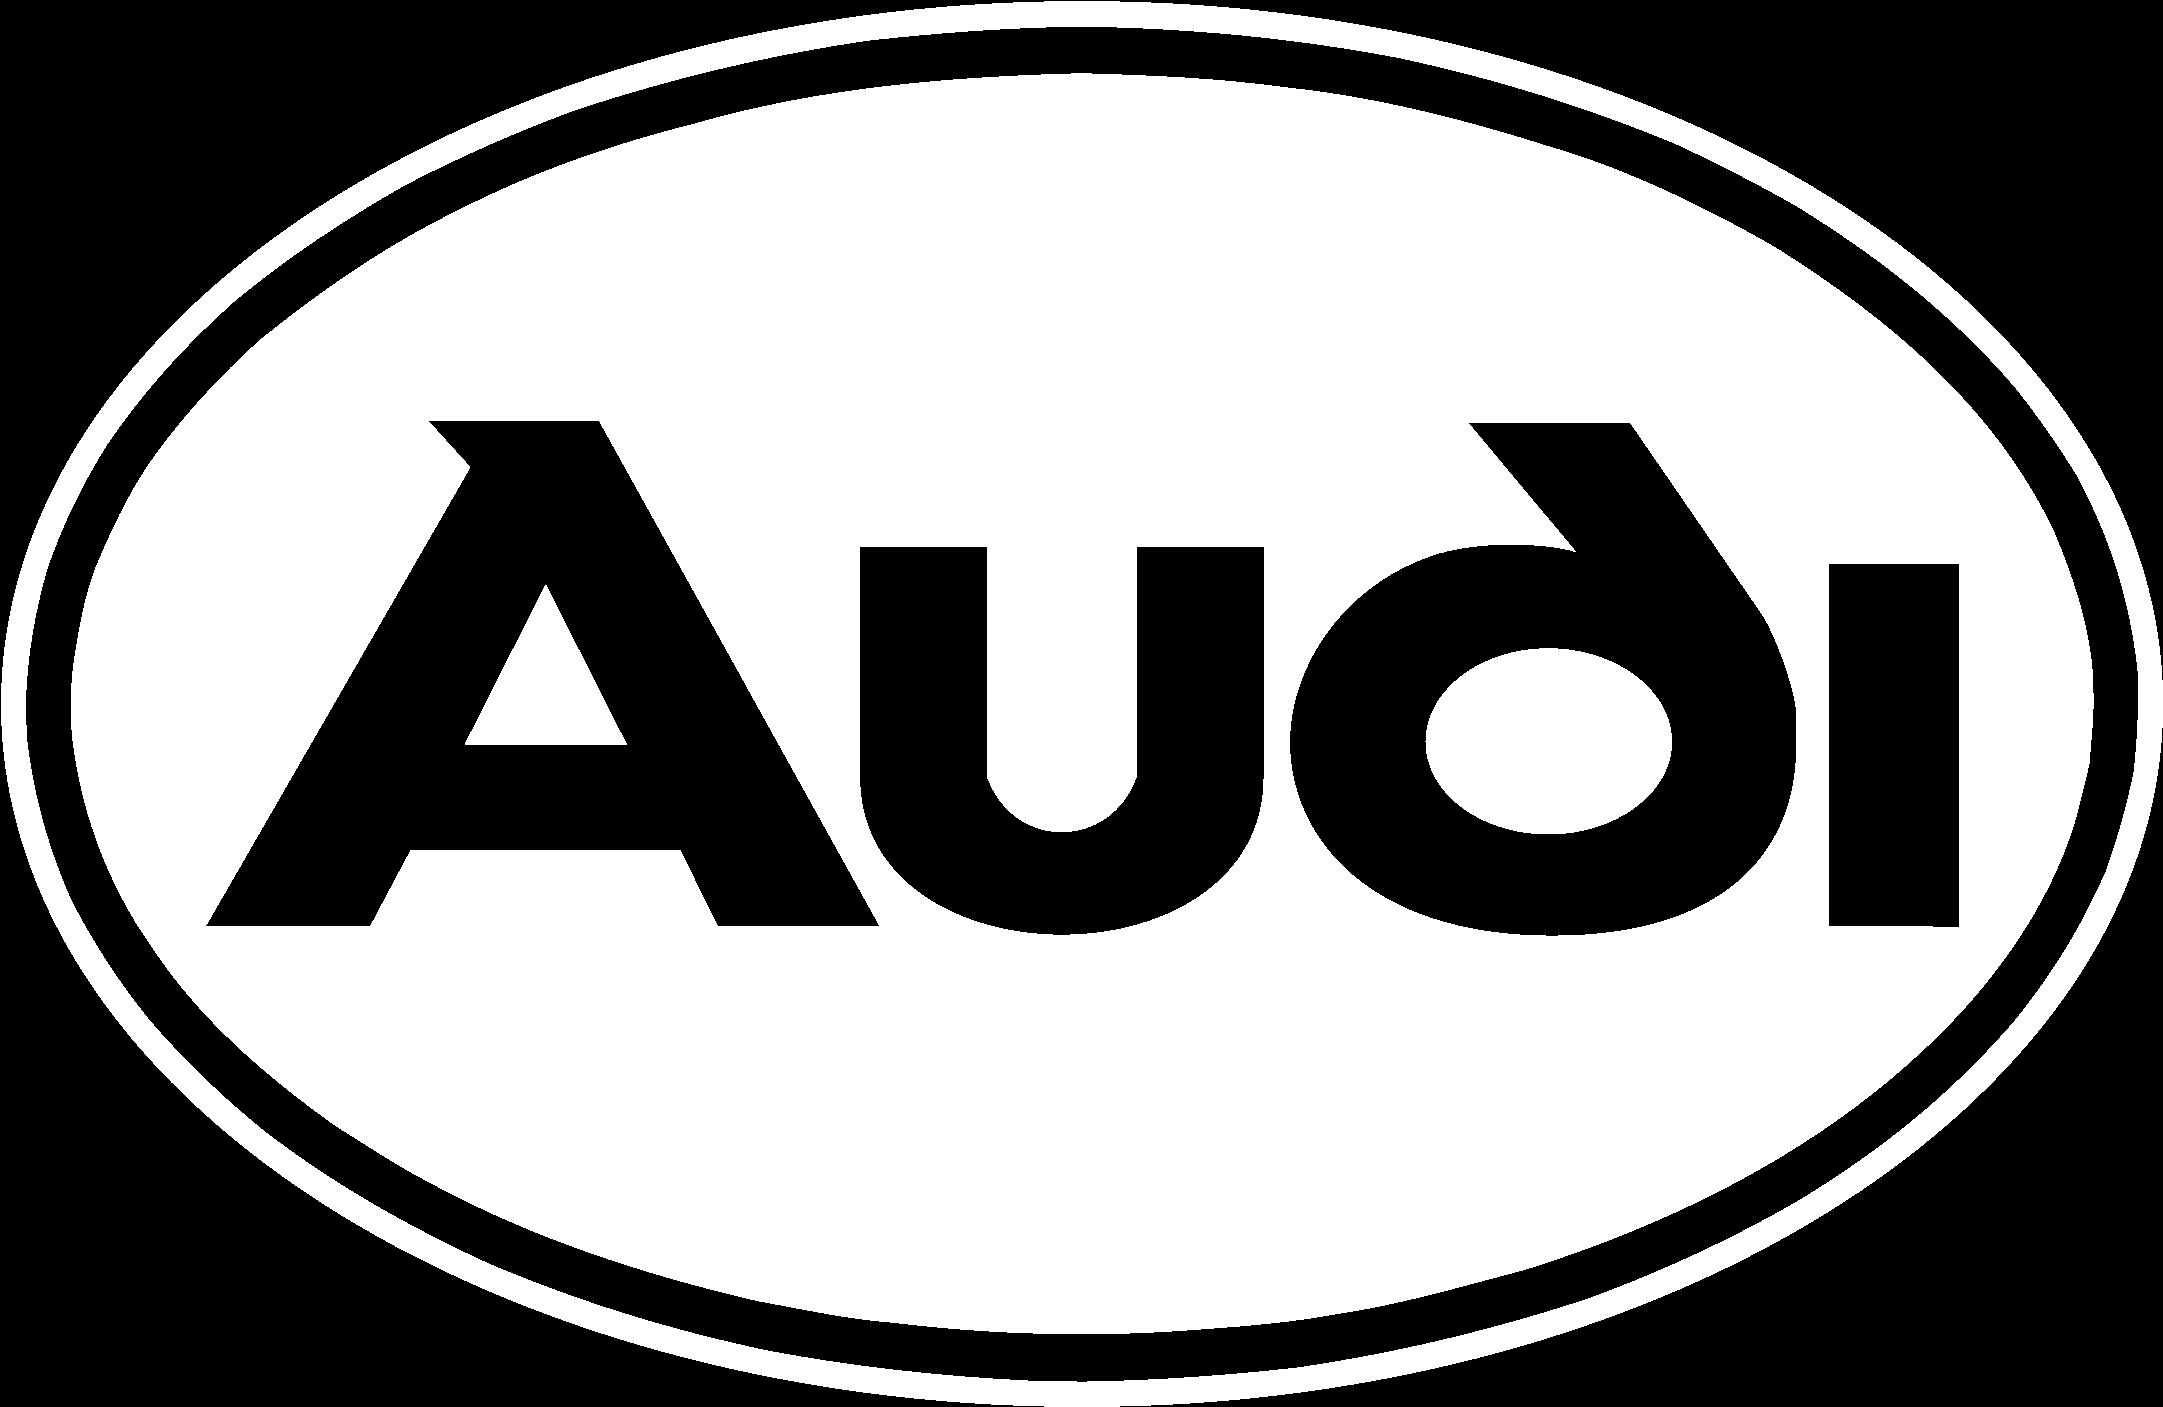 Download Audi Logo Black And White Anthem Game Logo Png Full Size Png Image Pngkit